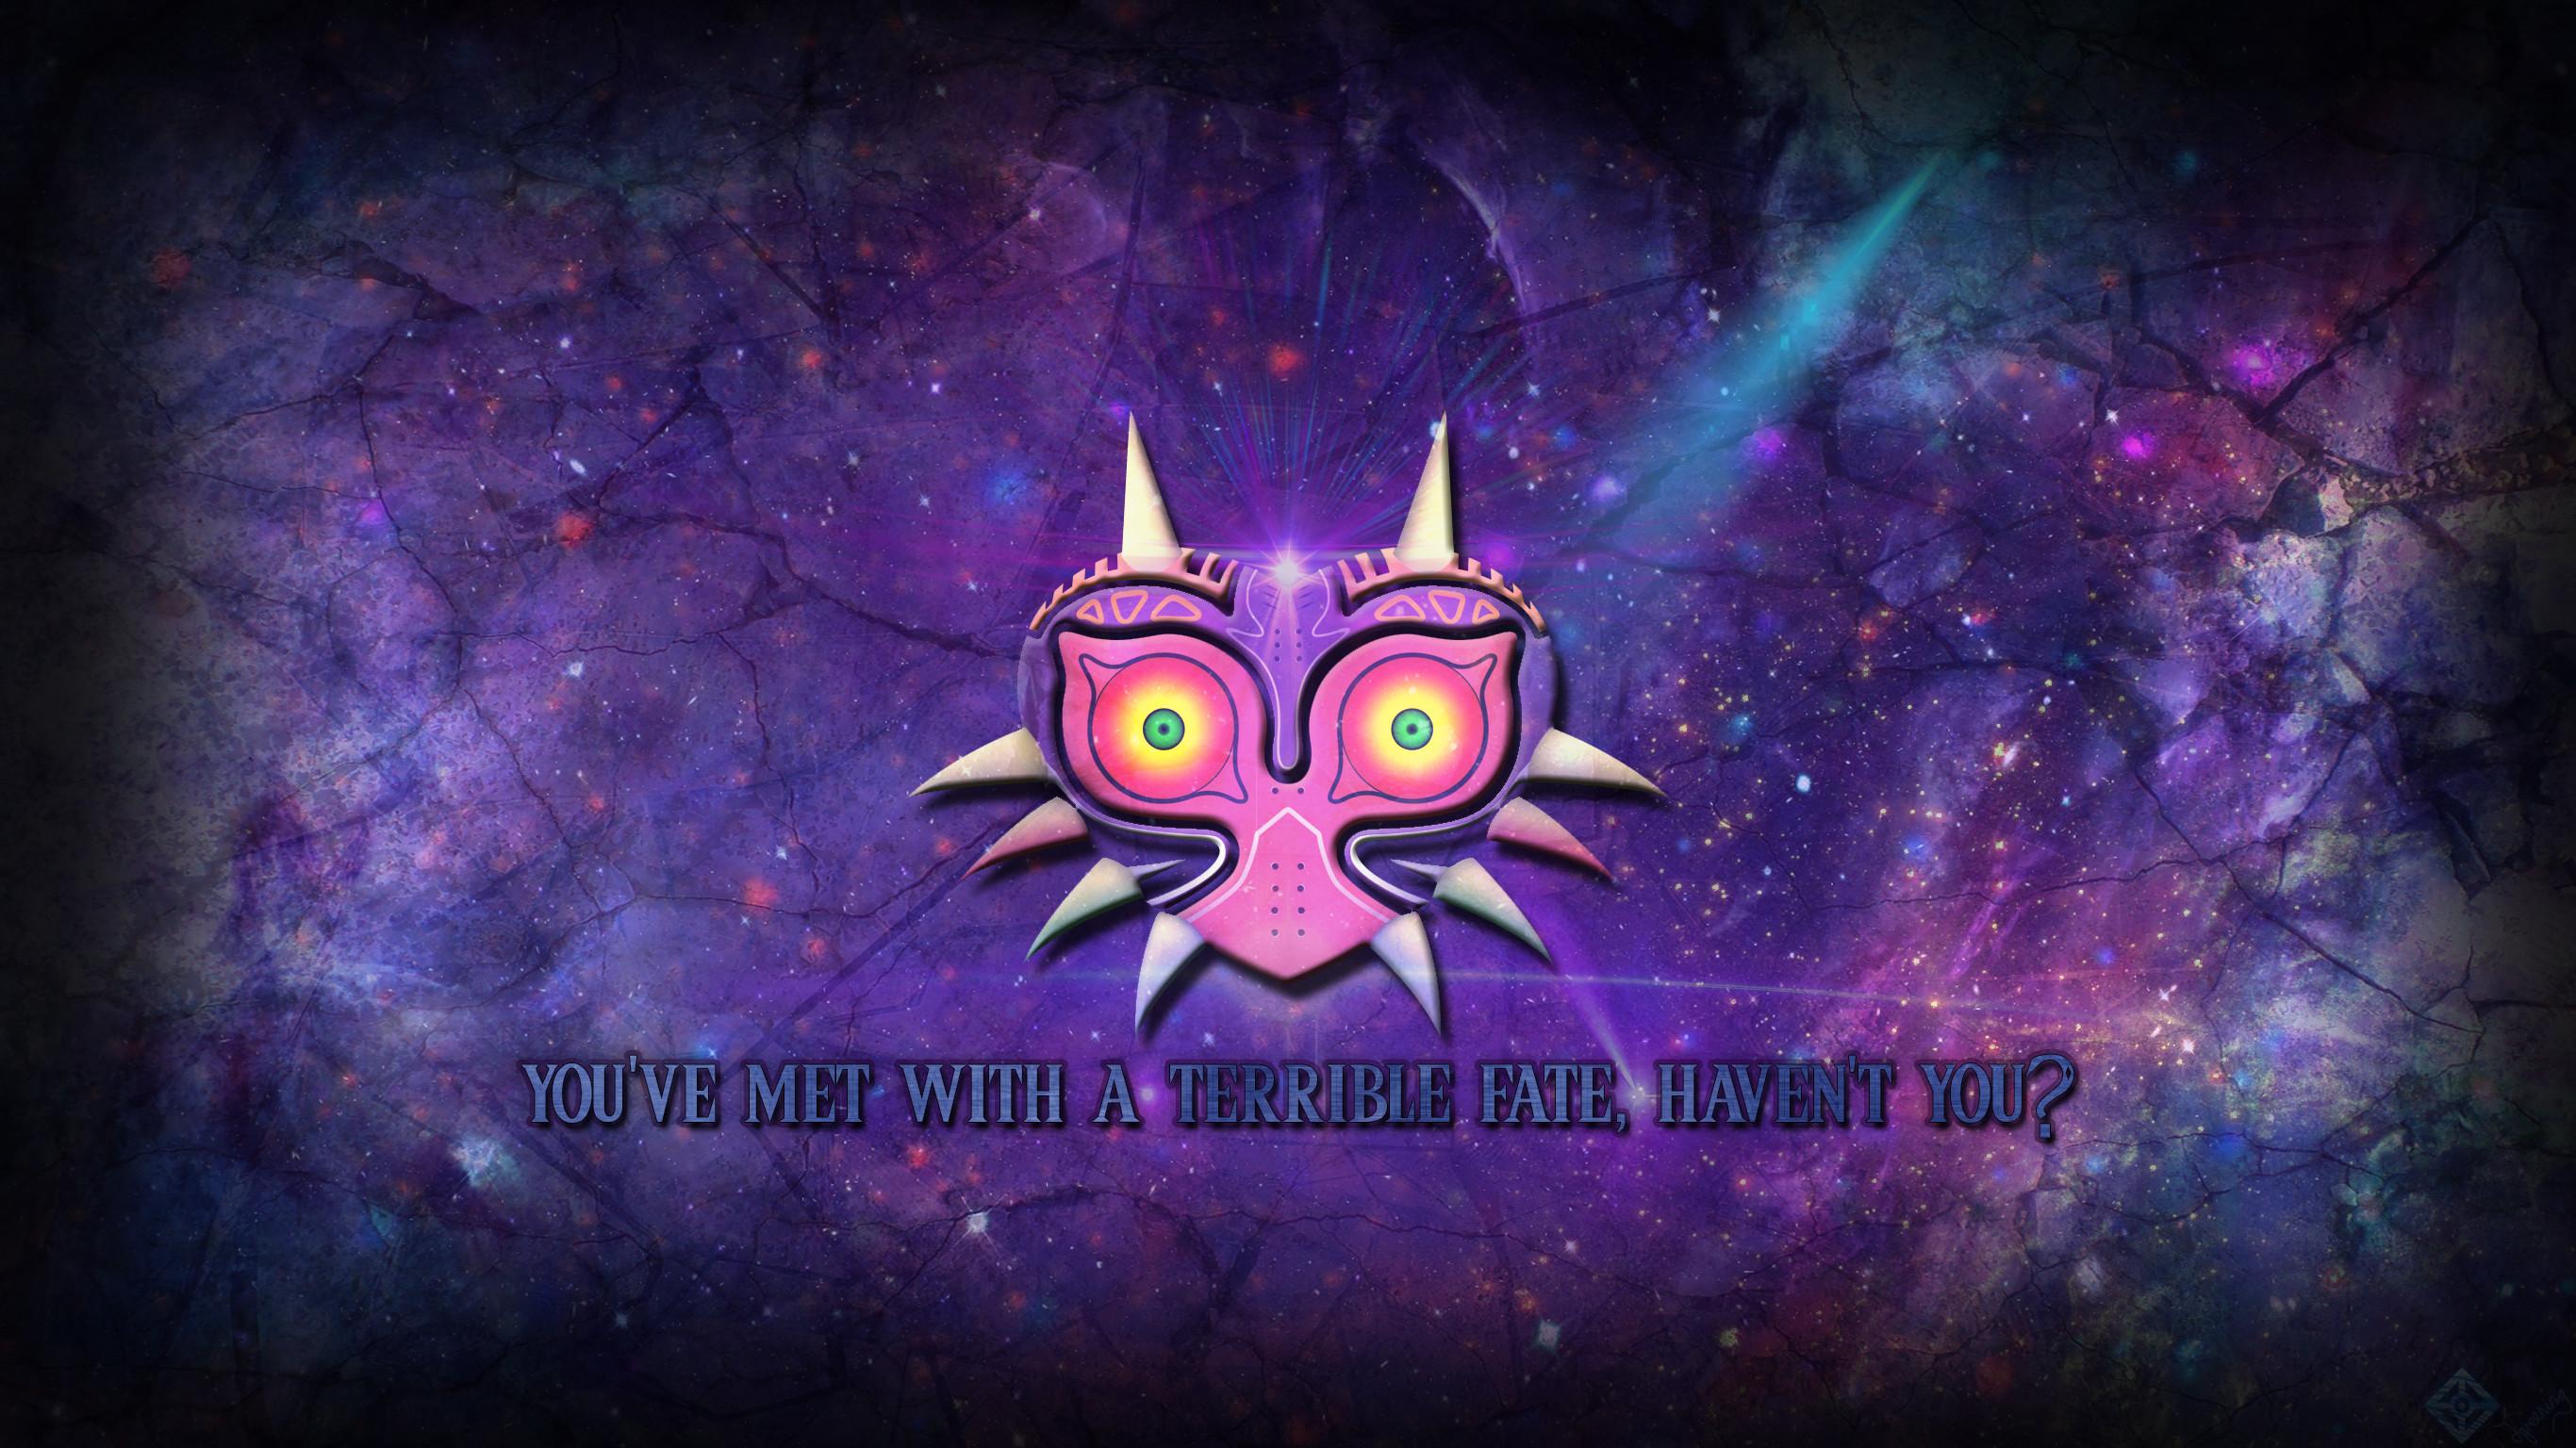 … Majora's Mask Wallpaper ALT 2 by JamesG2498